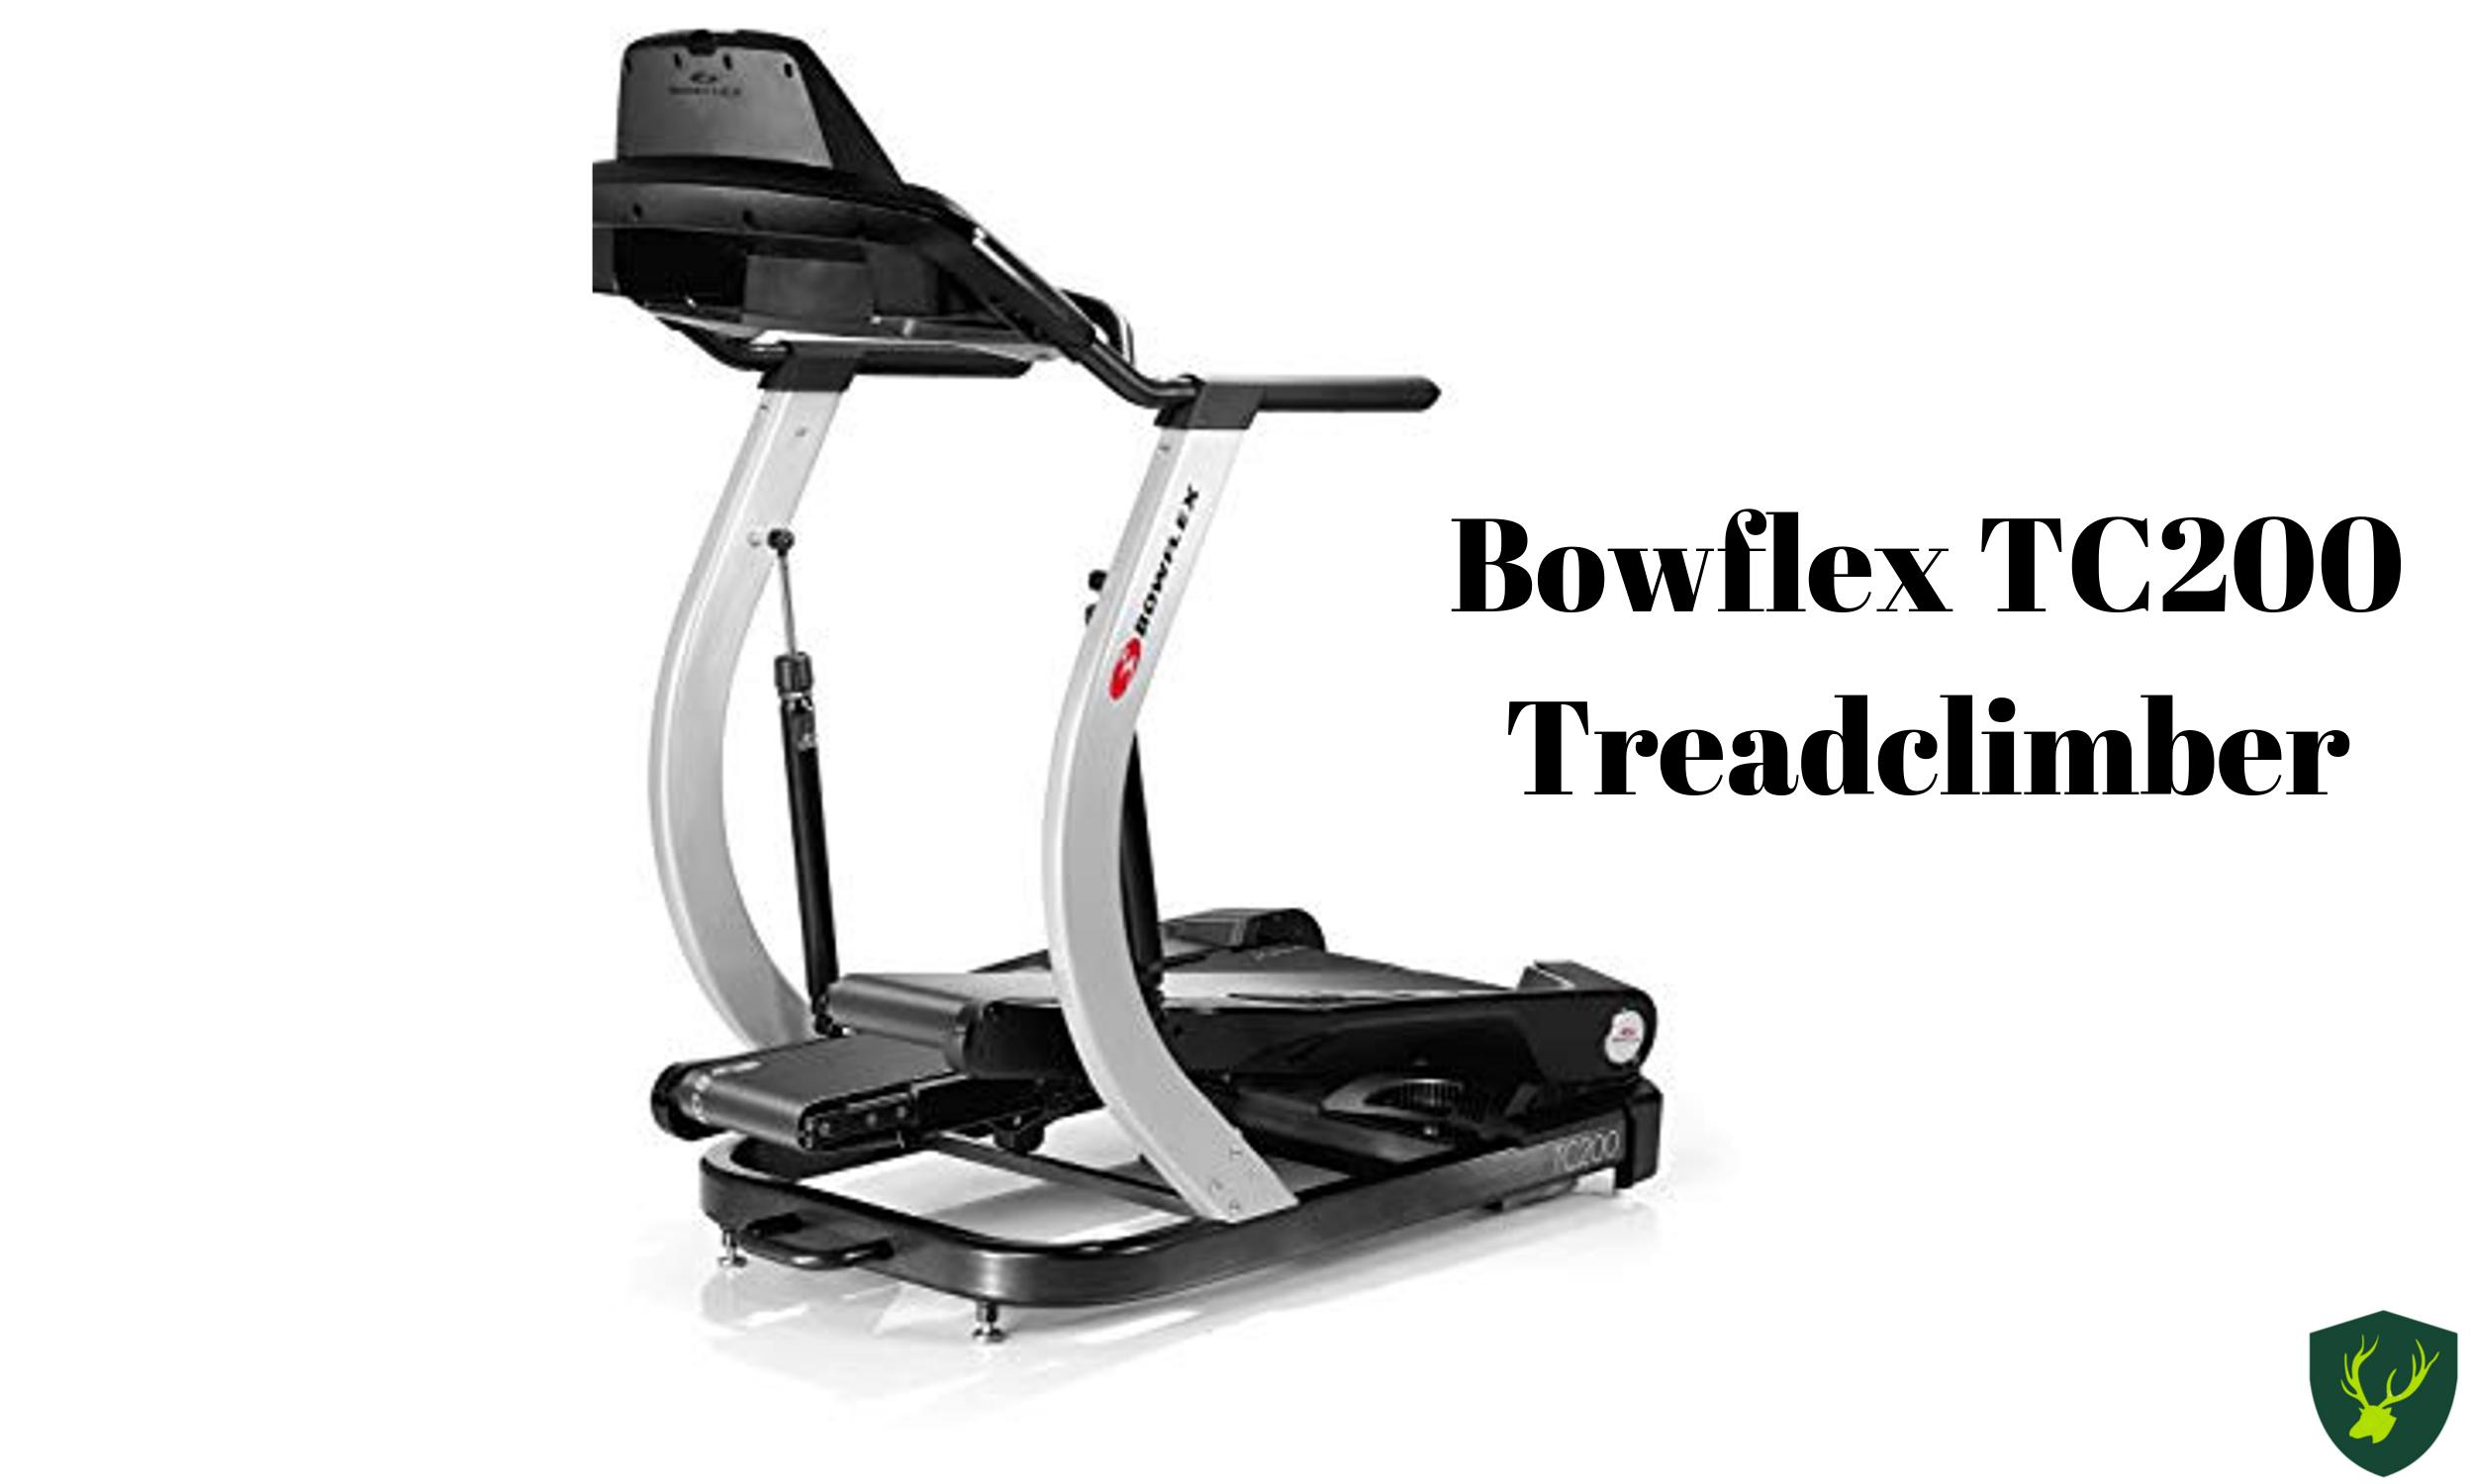 Bowflex Treadclimber Tc200 Latest Reviews Bowflex Stationary